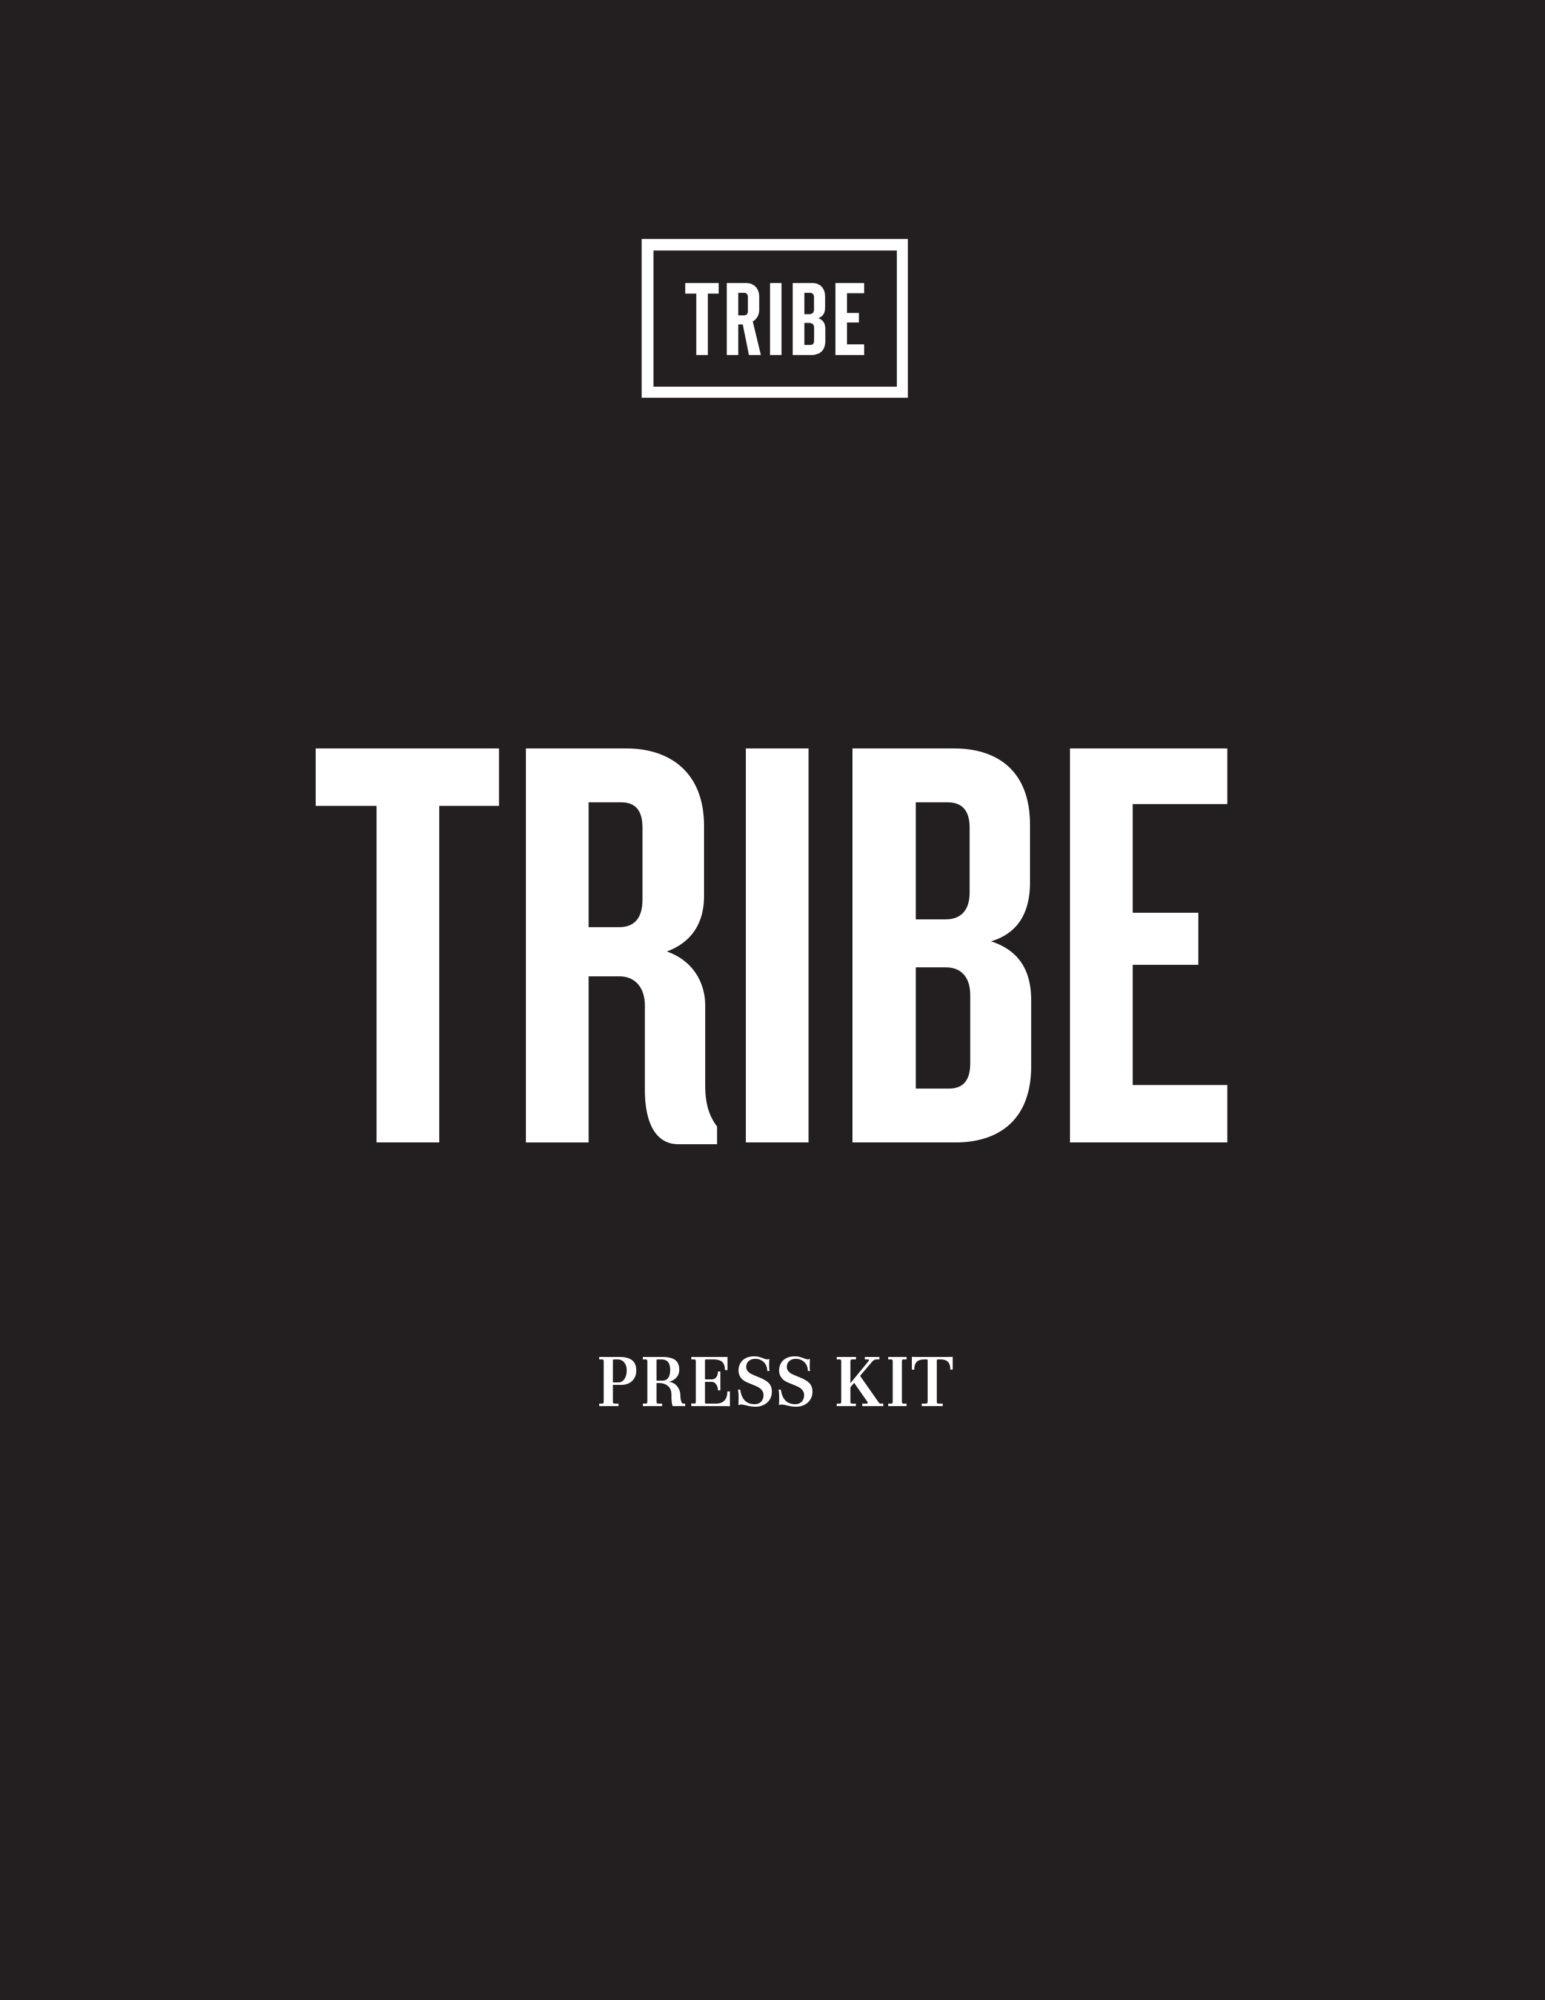 TRIBE Press kit - September 2020